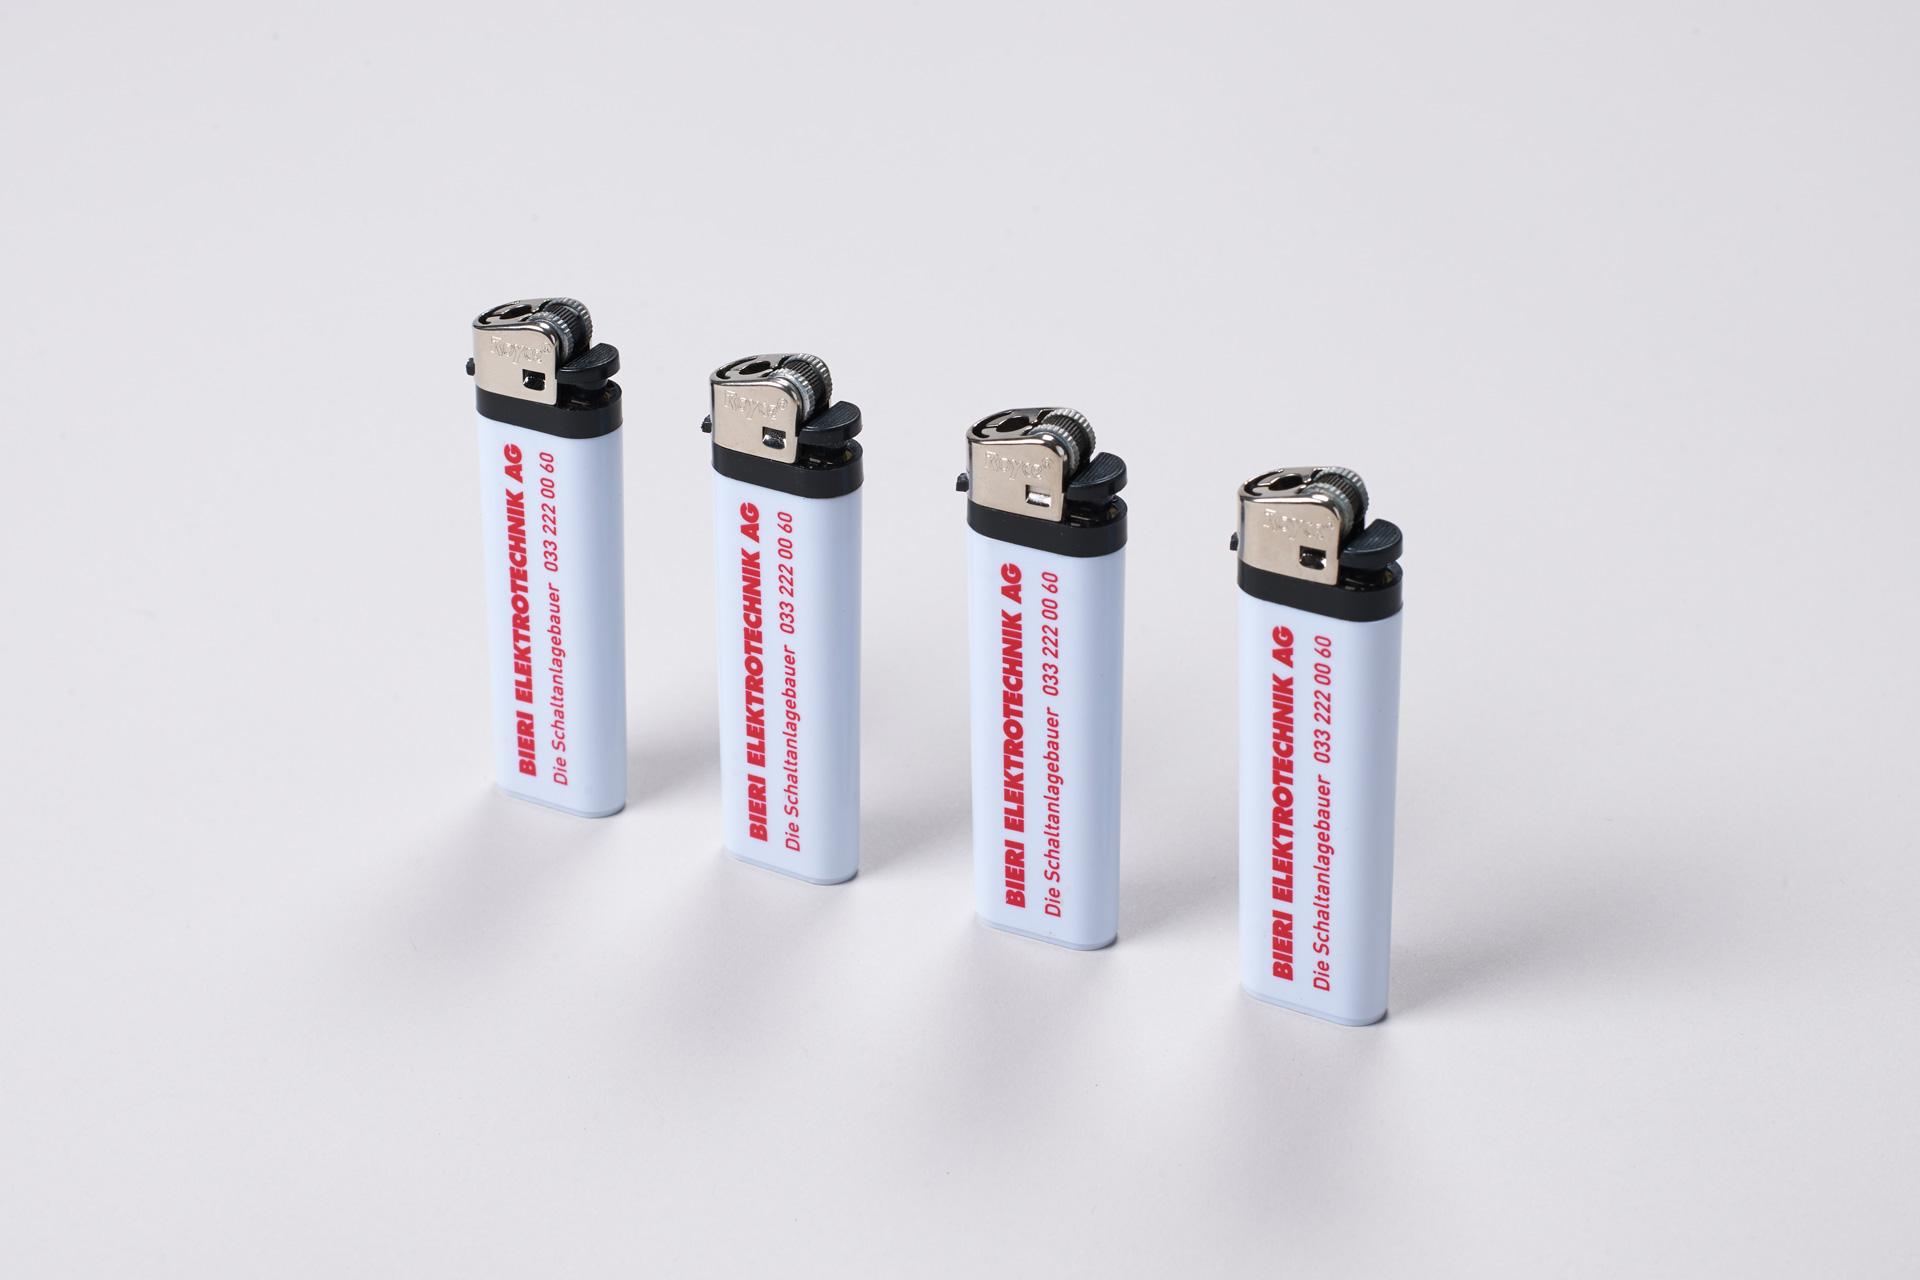 toloom-arbeiten-bieri-elektrotechnik-1-feuerzeuge.jpg